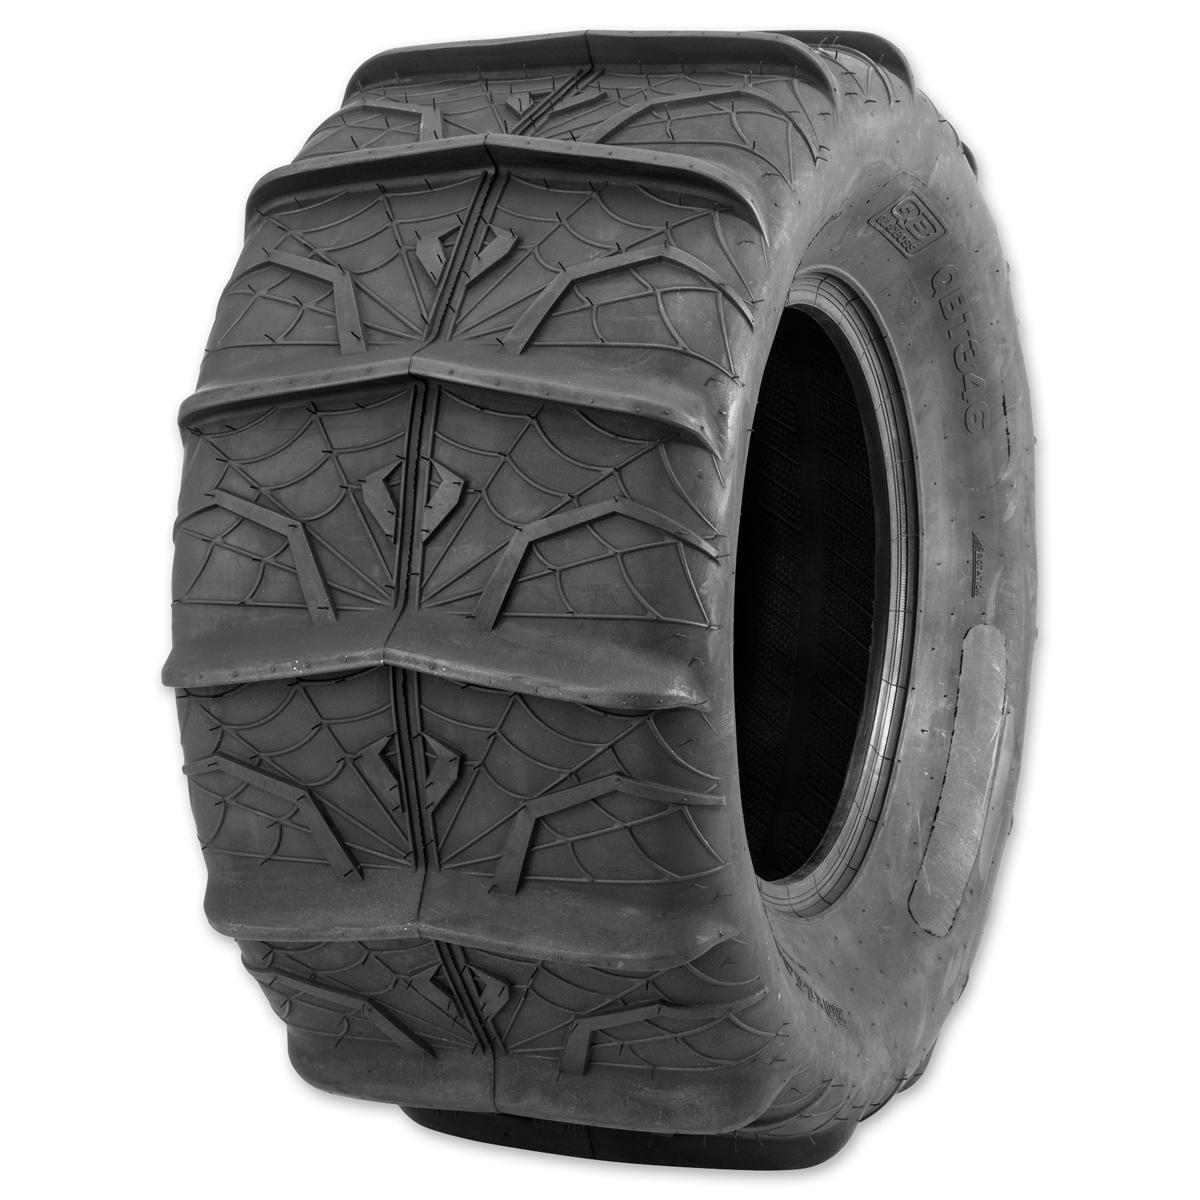 Quadboss QBT346 Sand 28X13-14 6-Ply Rear Tire